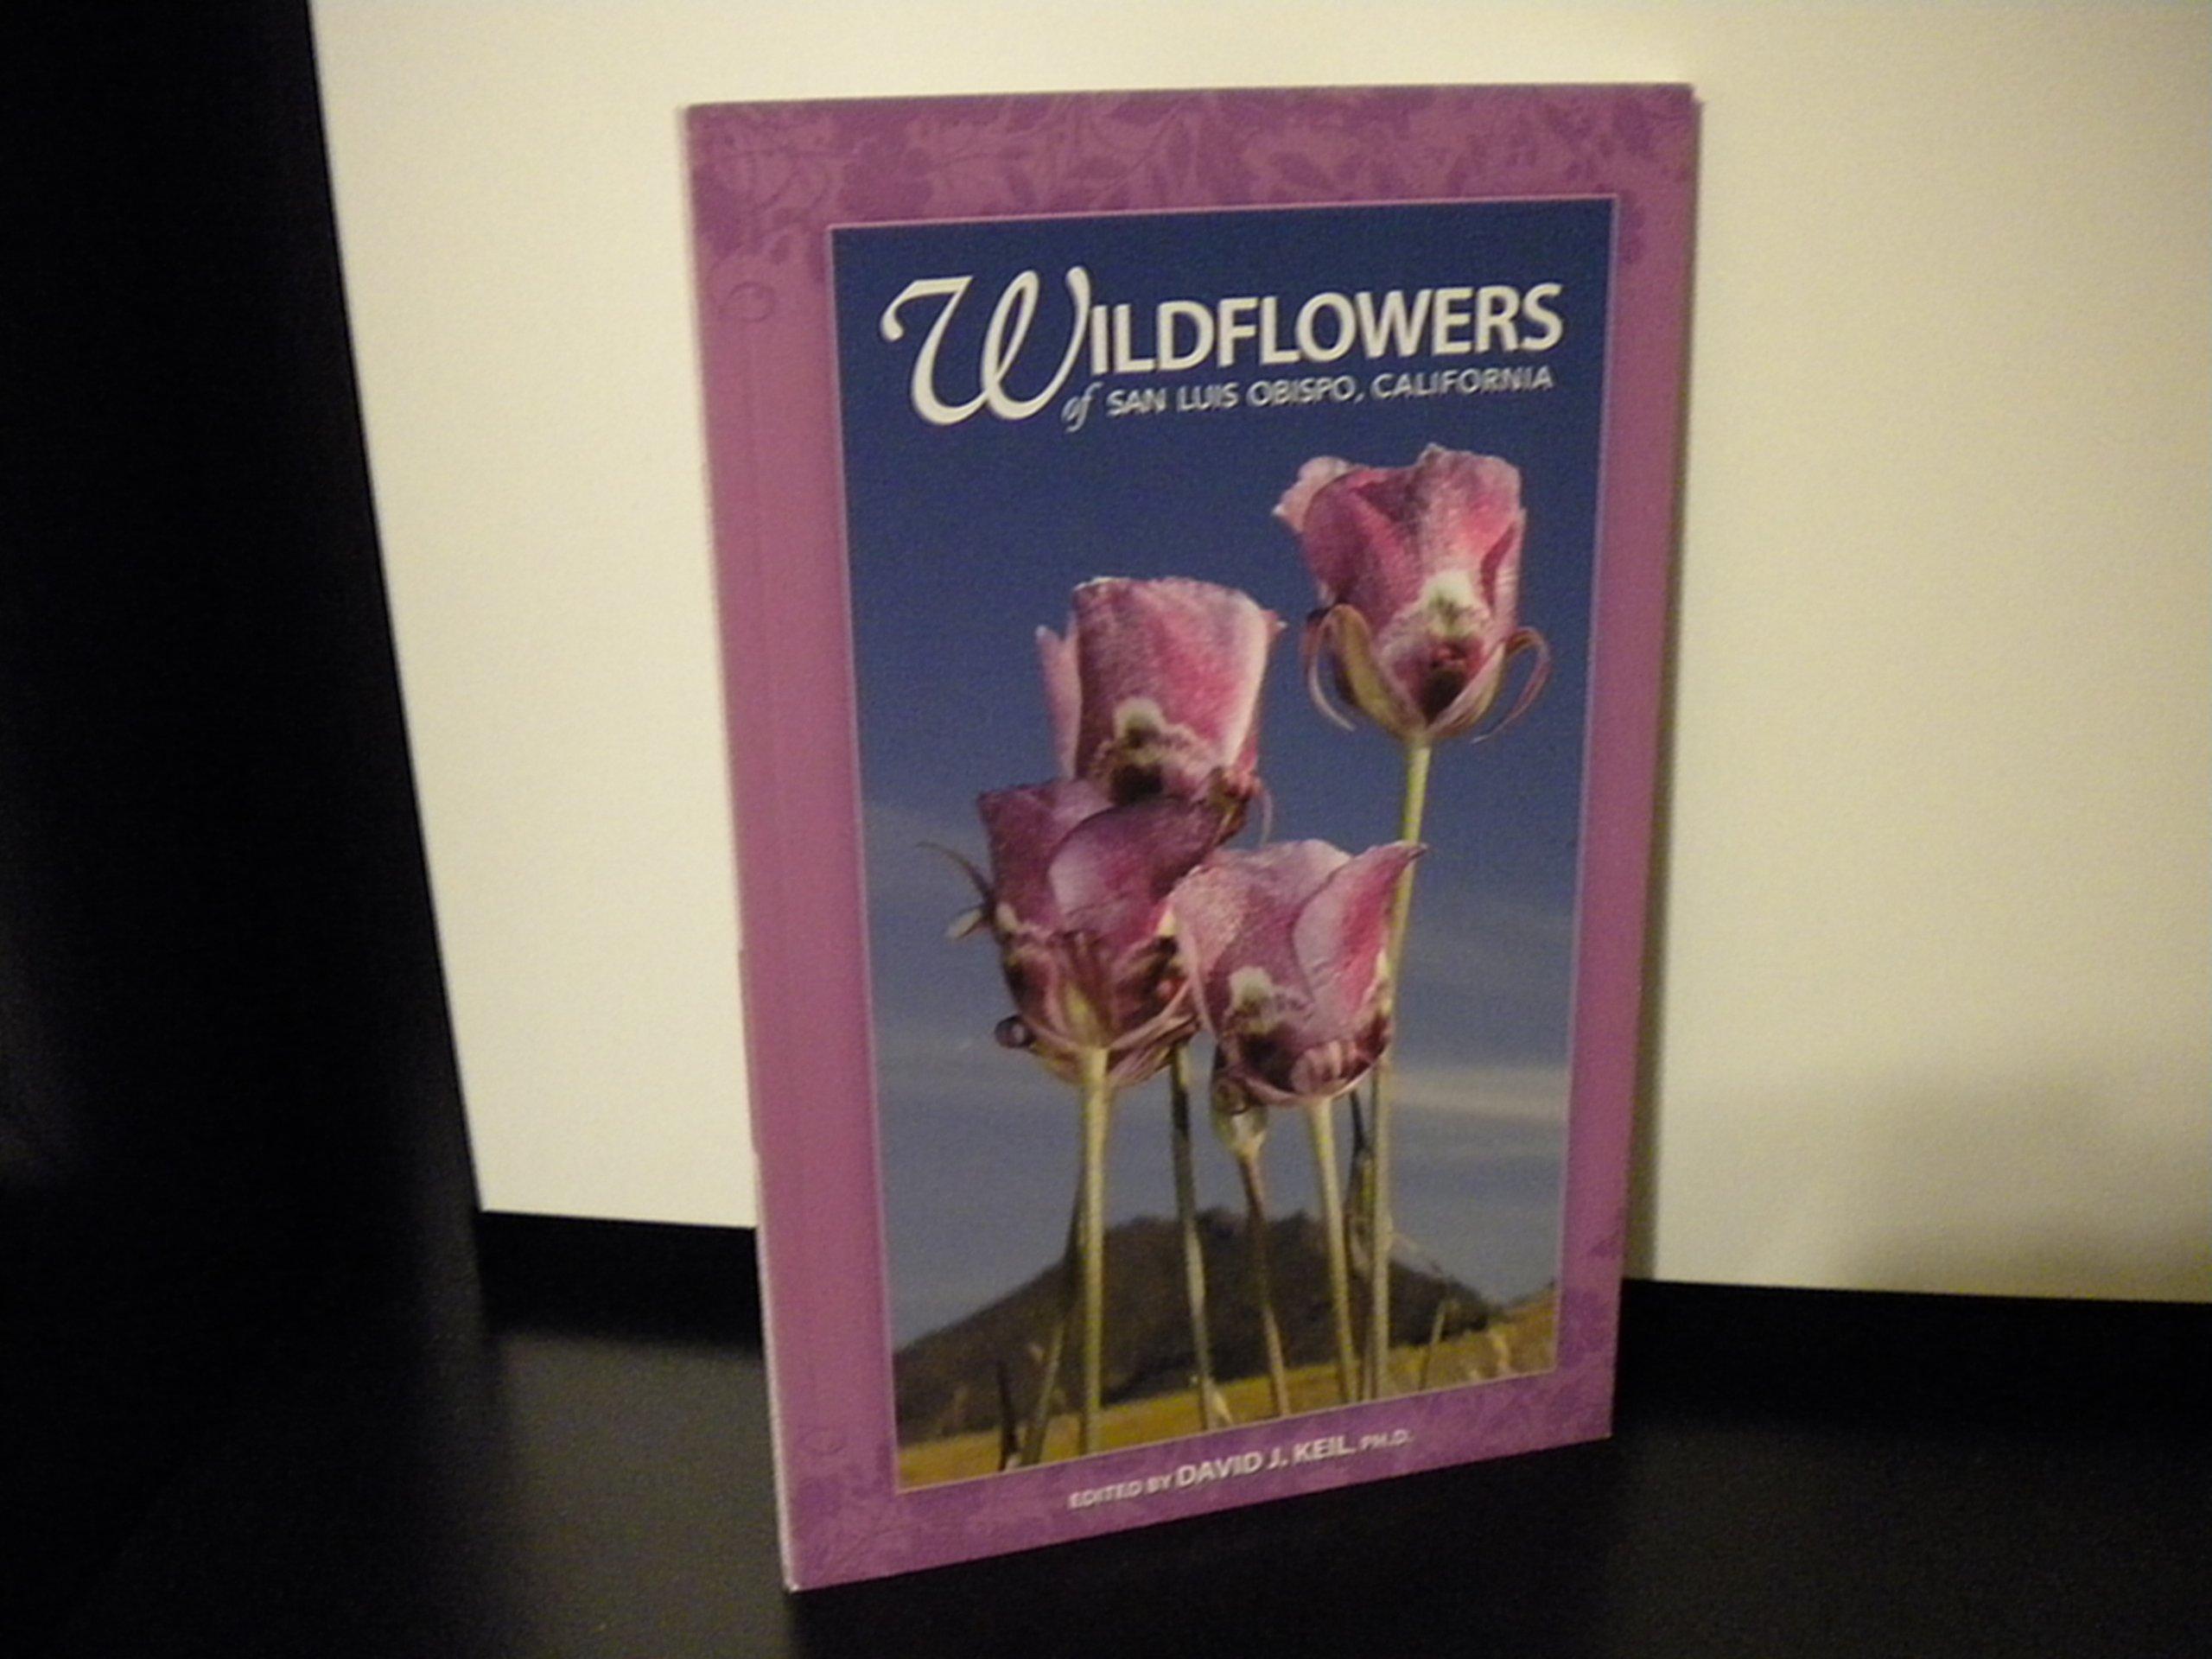 Wildflowers of San Luis Obispo, California